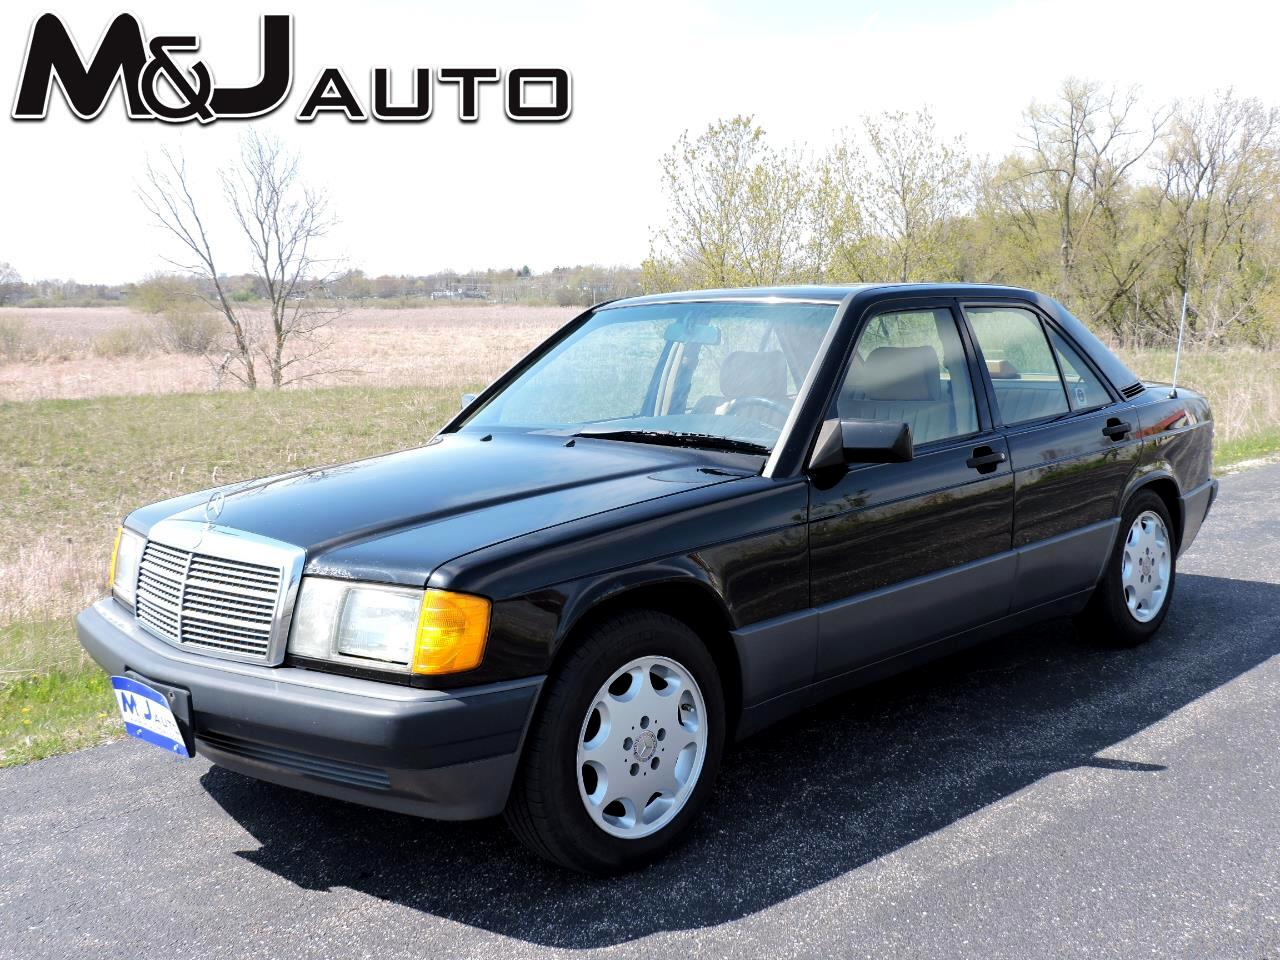 Mercedes-Benz 190 Series 4dr Sedan 190E 2.3 Auto 1992